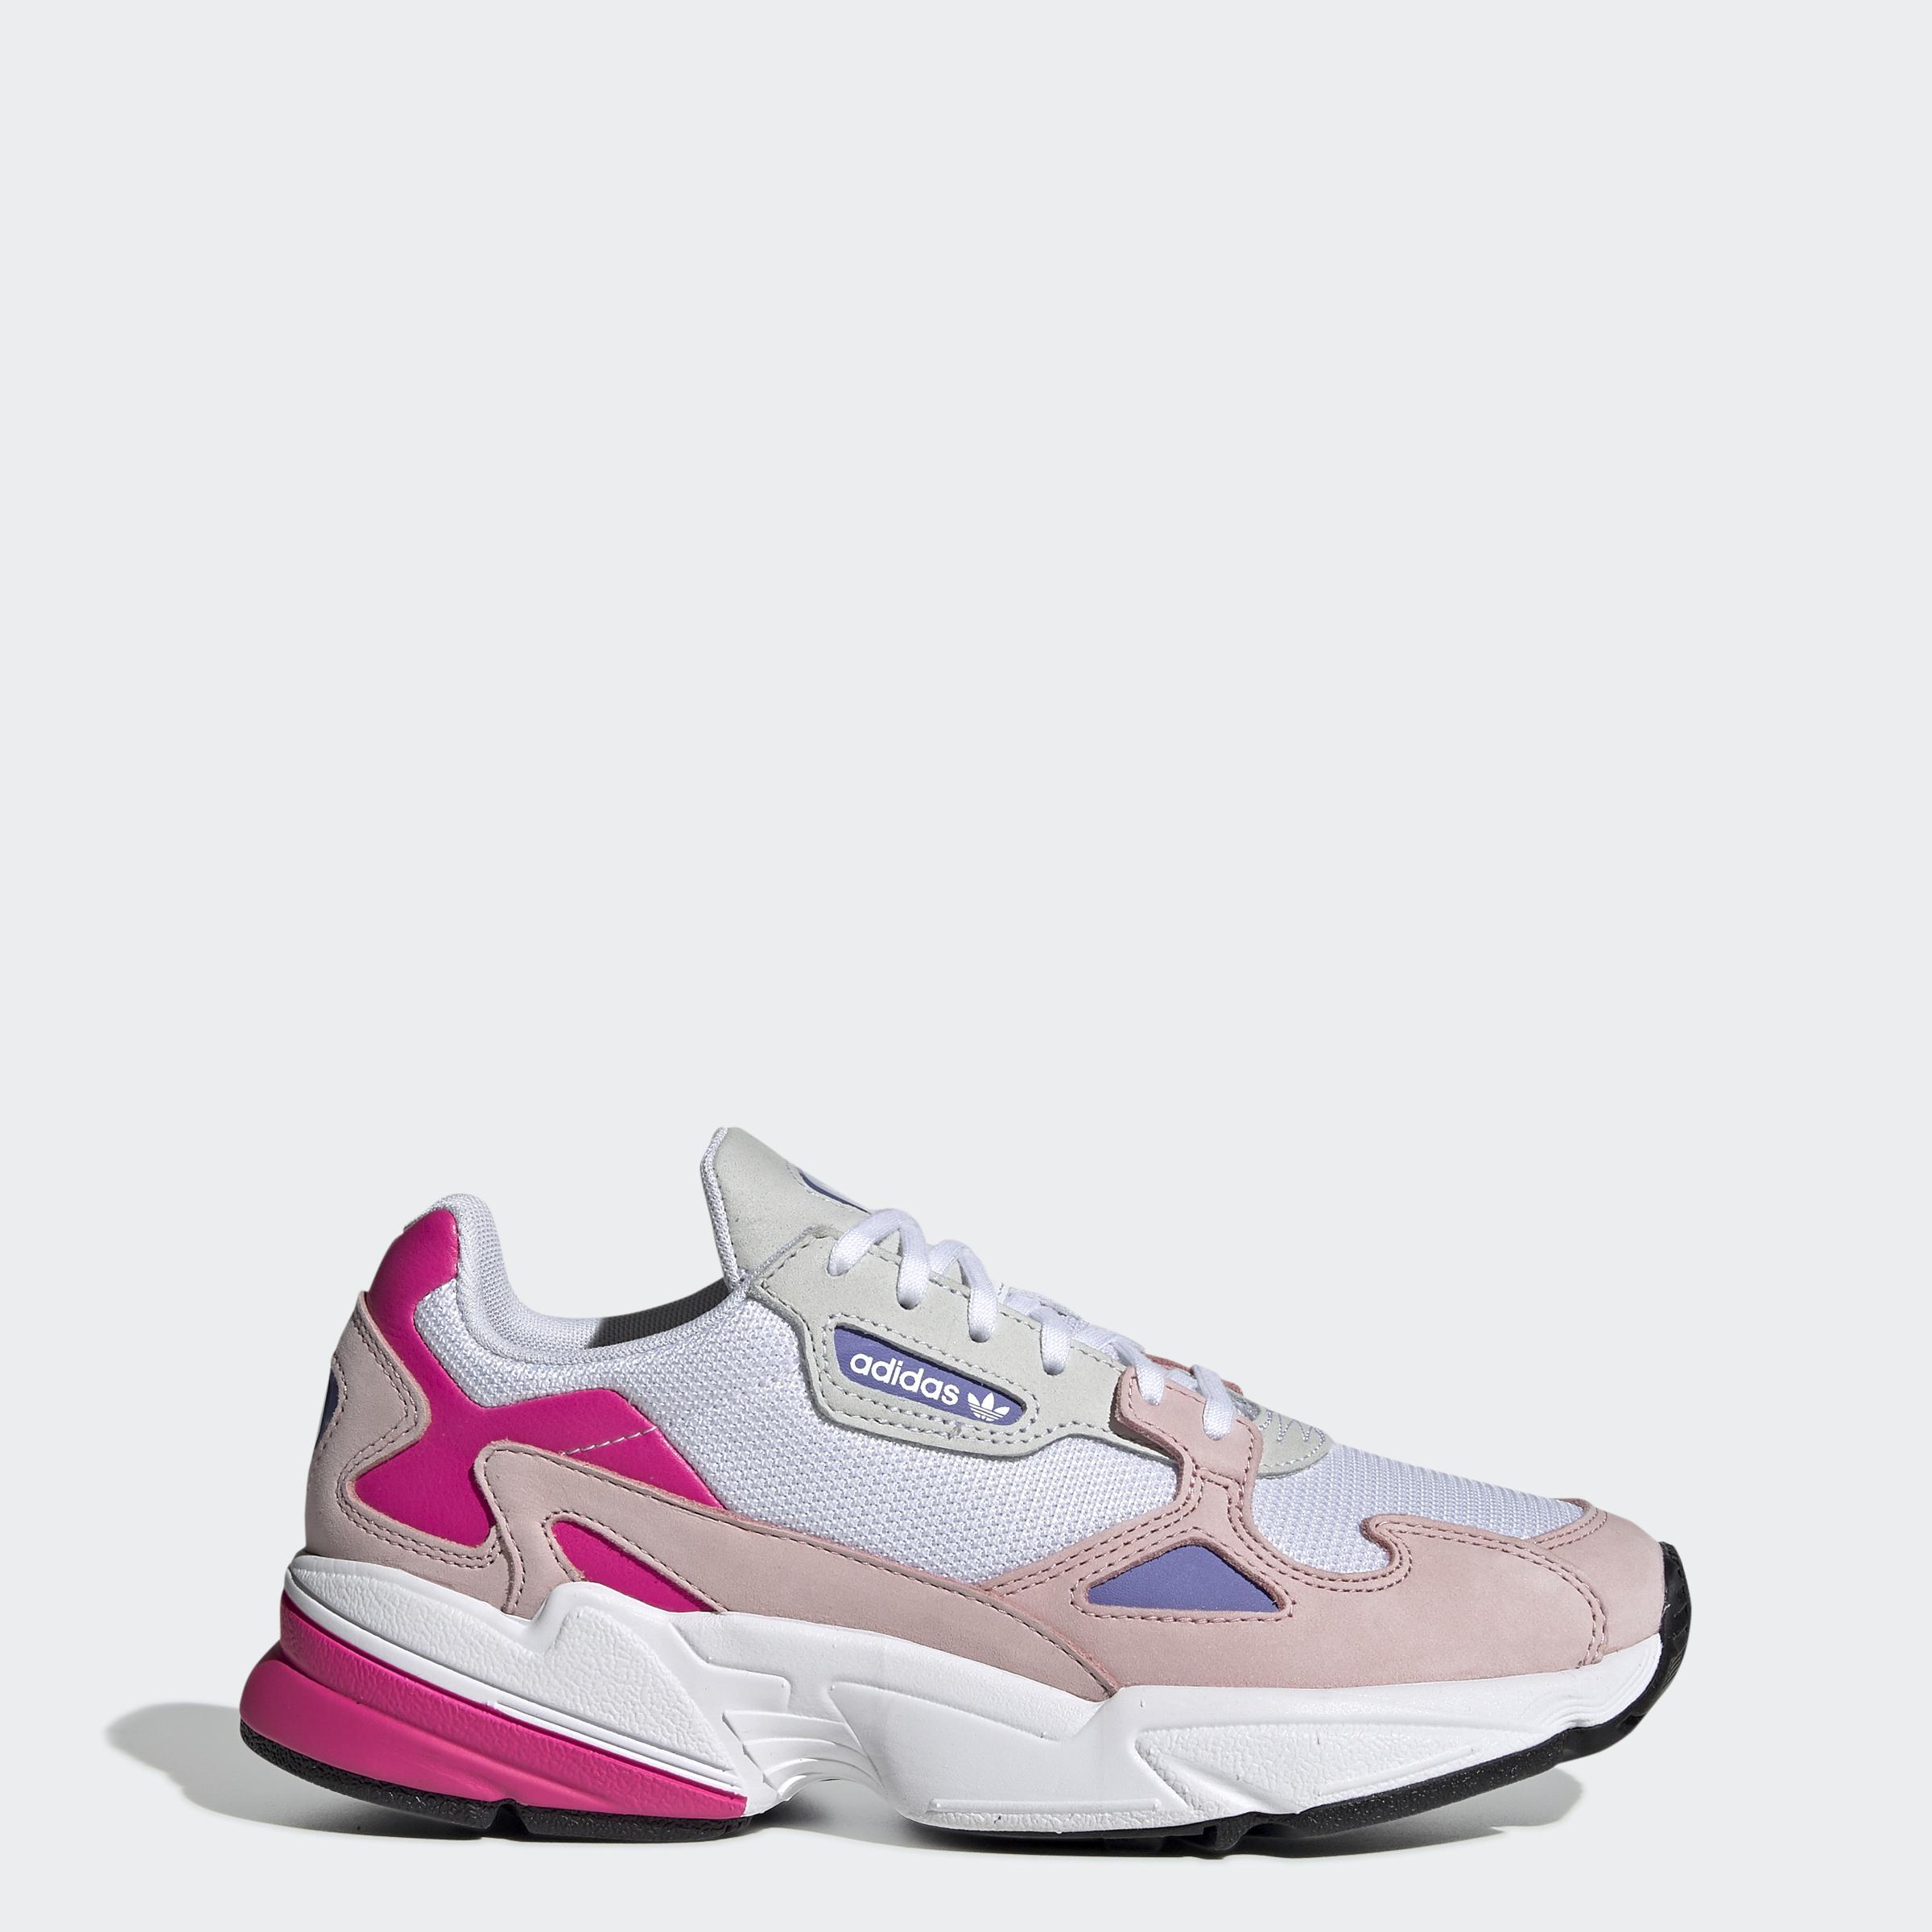 adidas-Originals-Falcon-Shoes-Women-039-s thumbnail 82